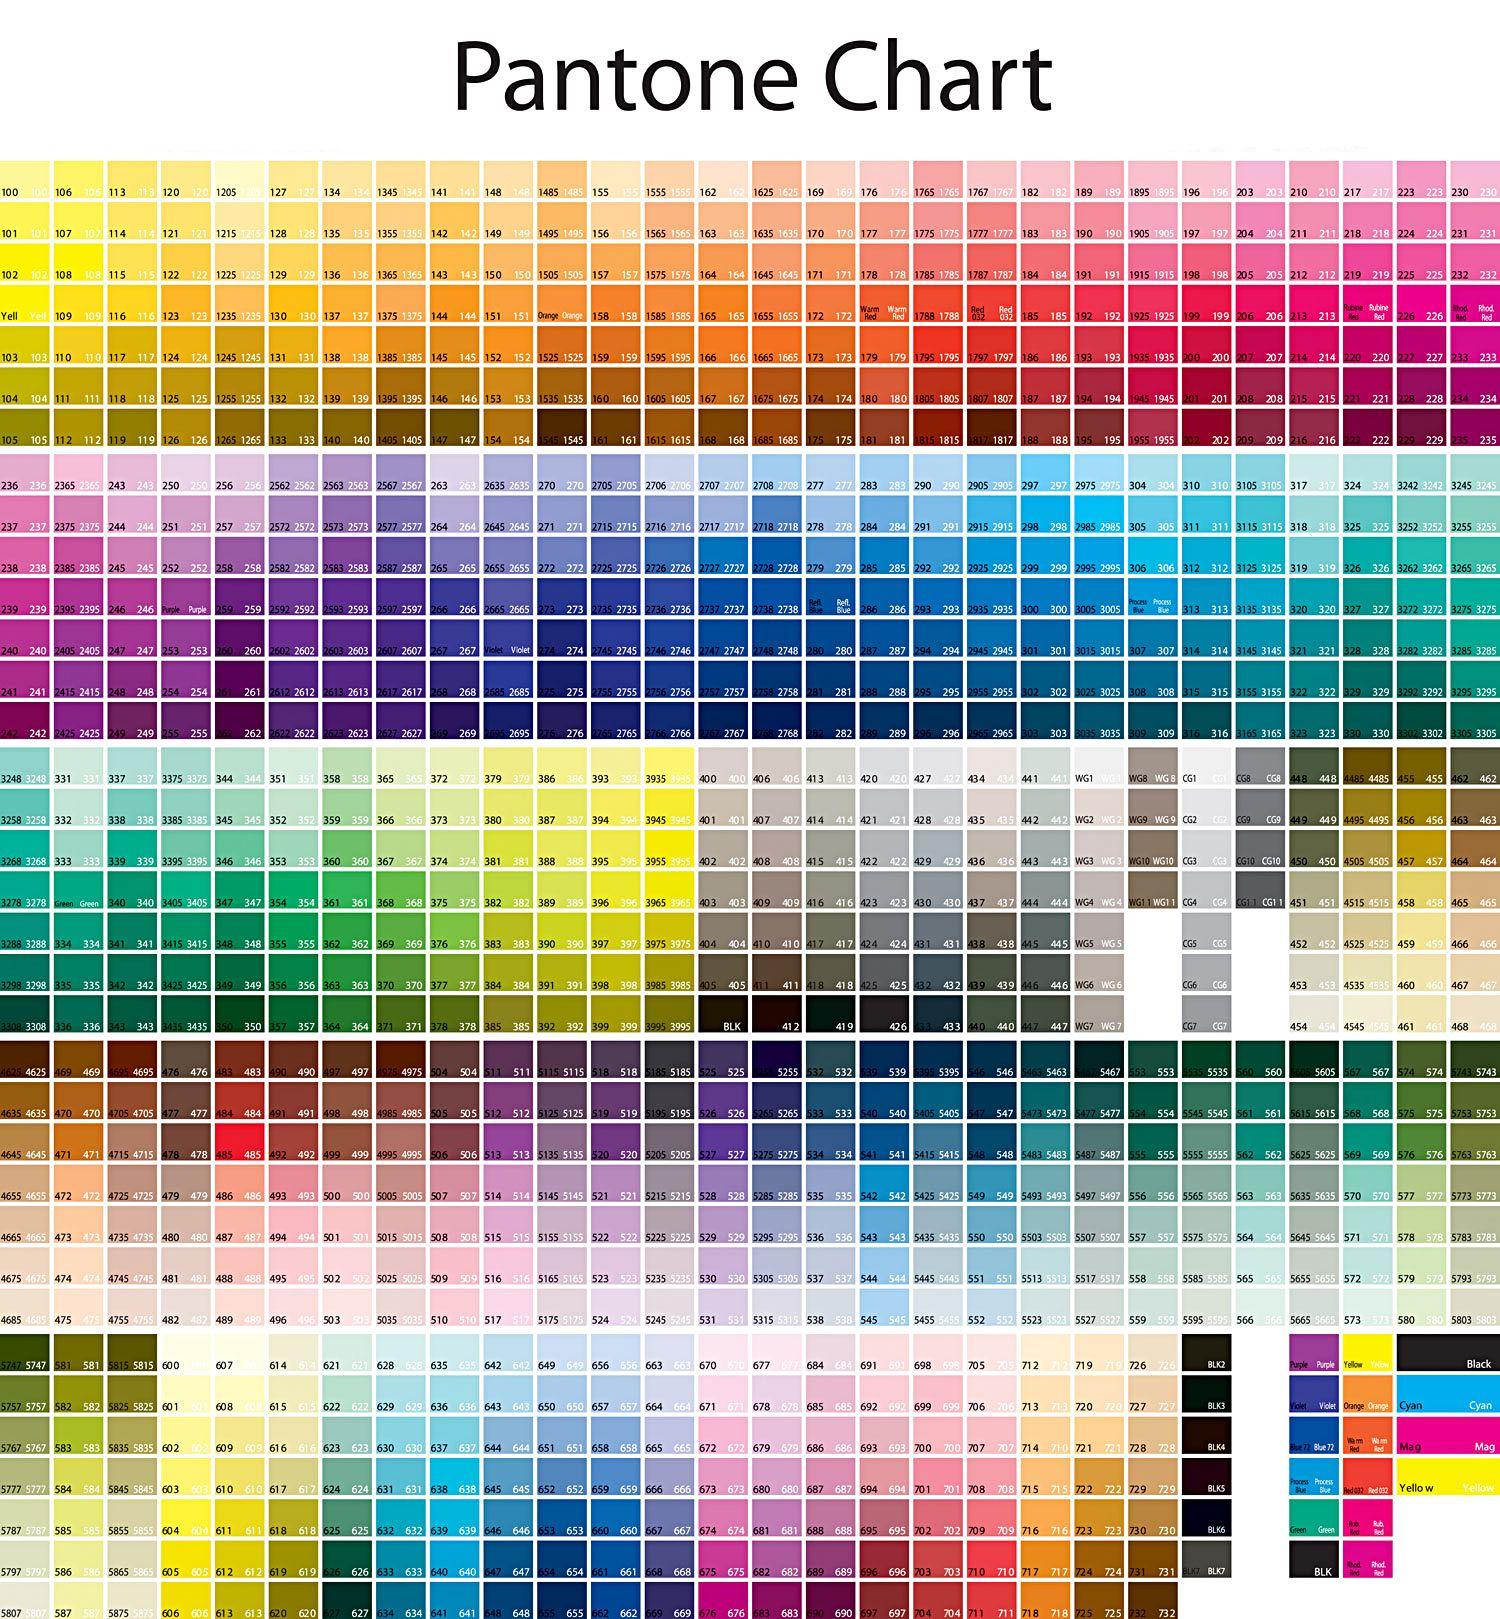 p chart pdf